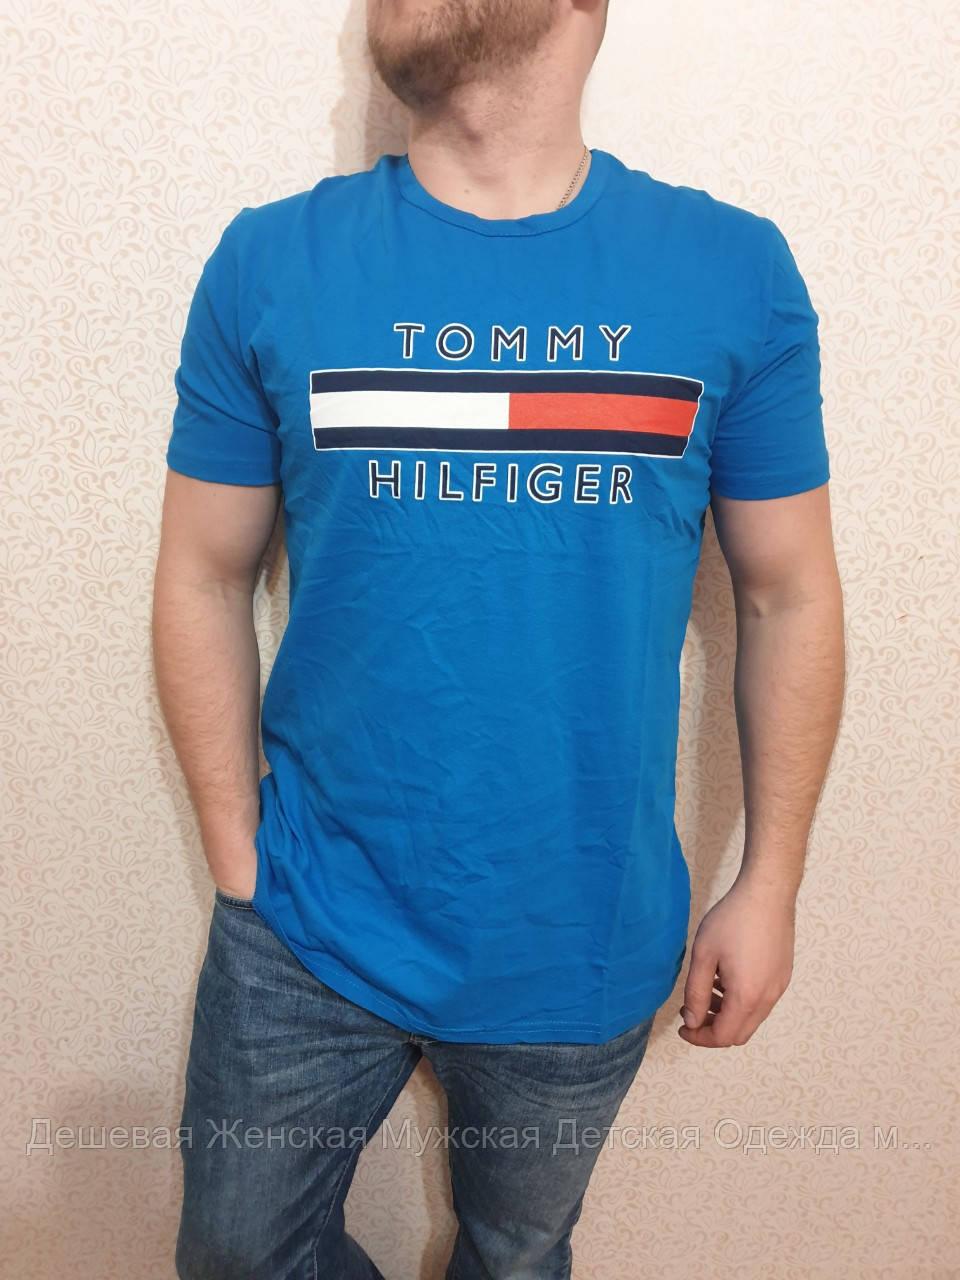 Футболка мужская бренд Пр-во Турция